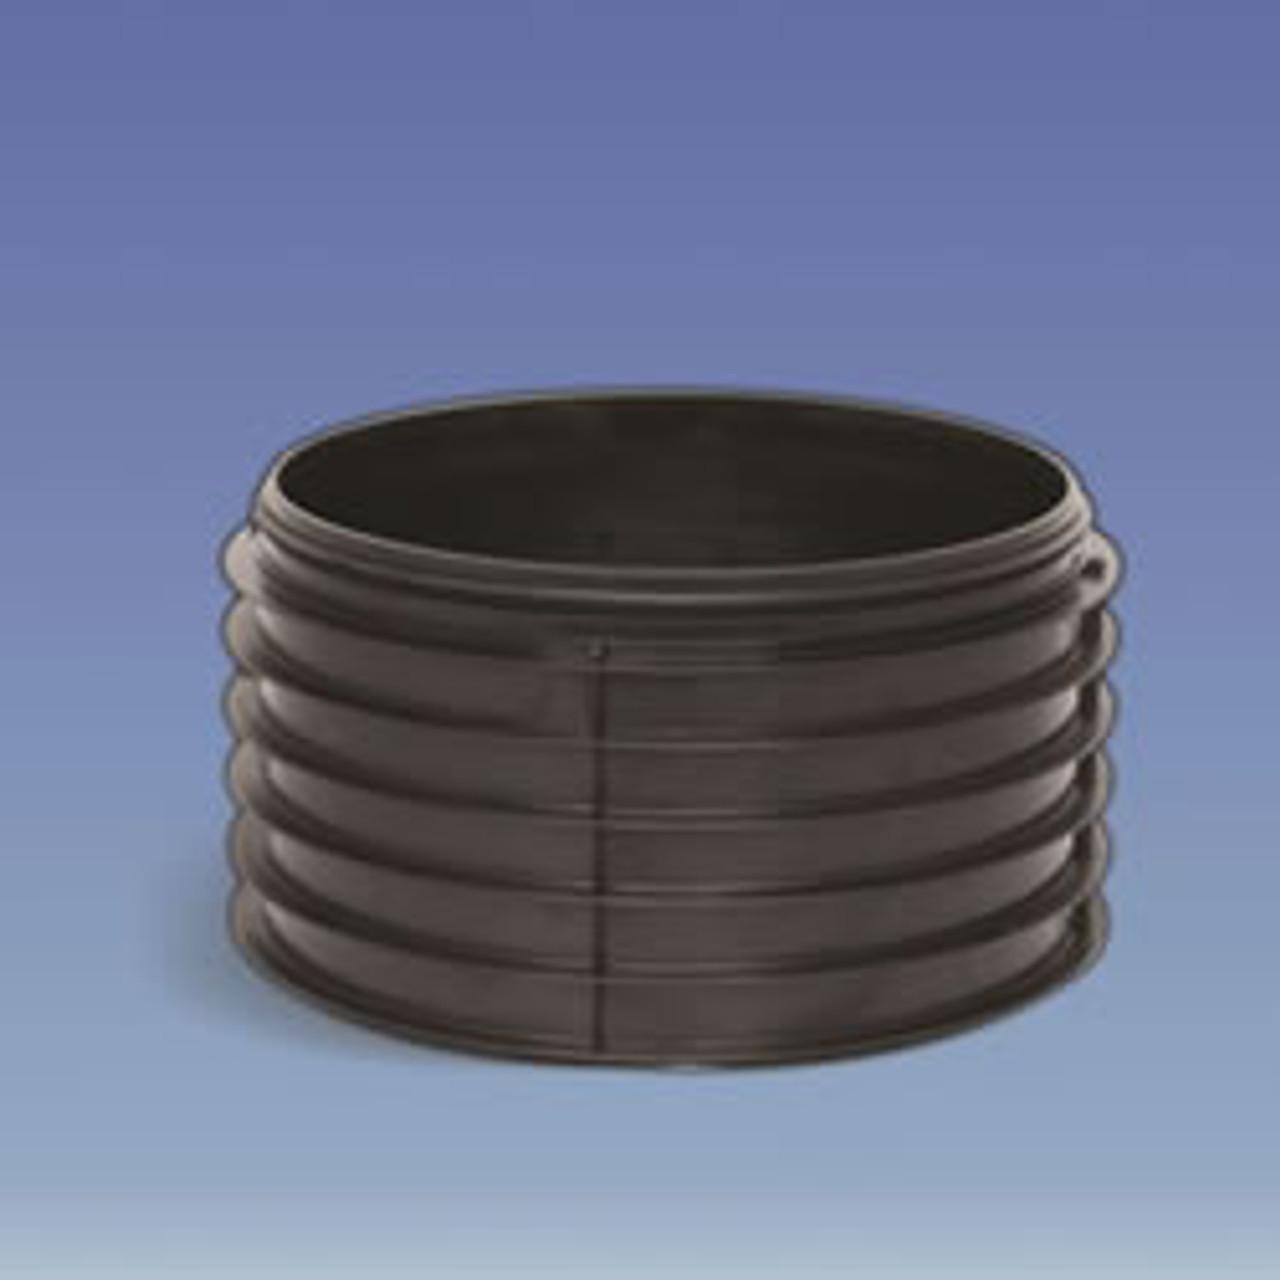 450 x 235mm Chamber Riser (incl Seal)